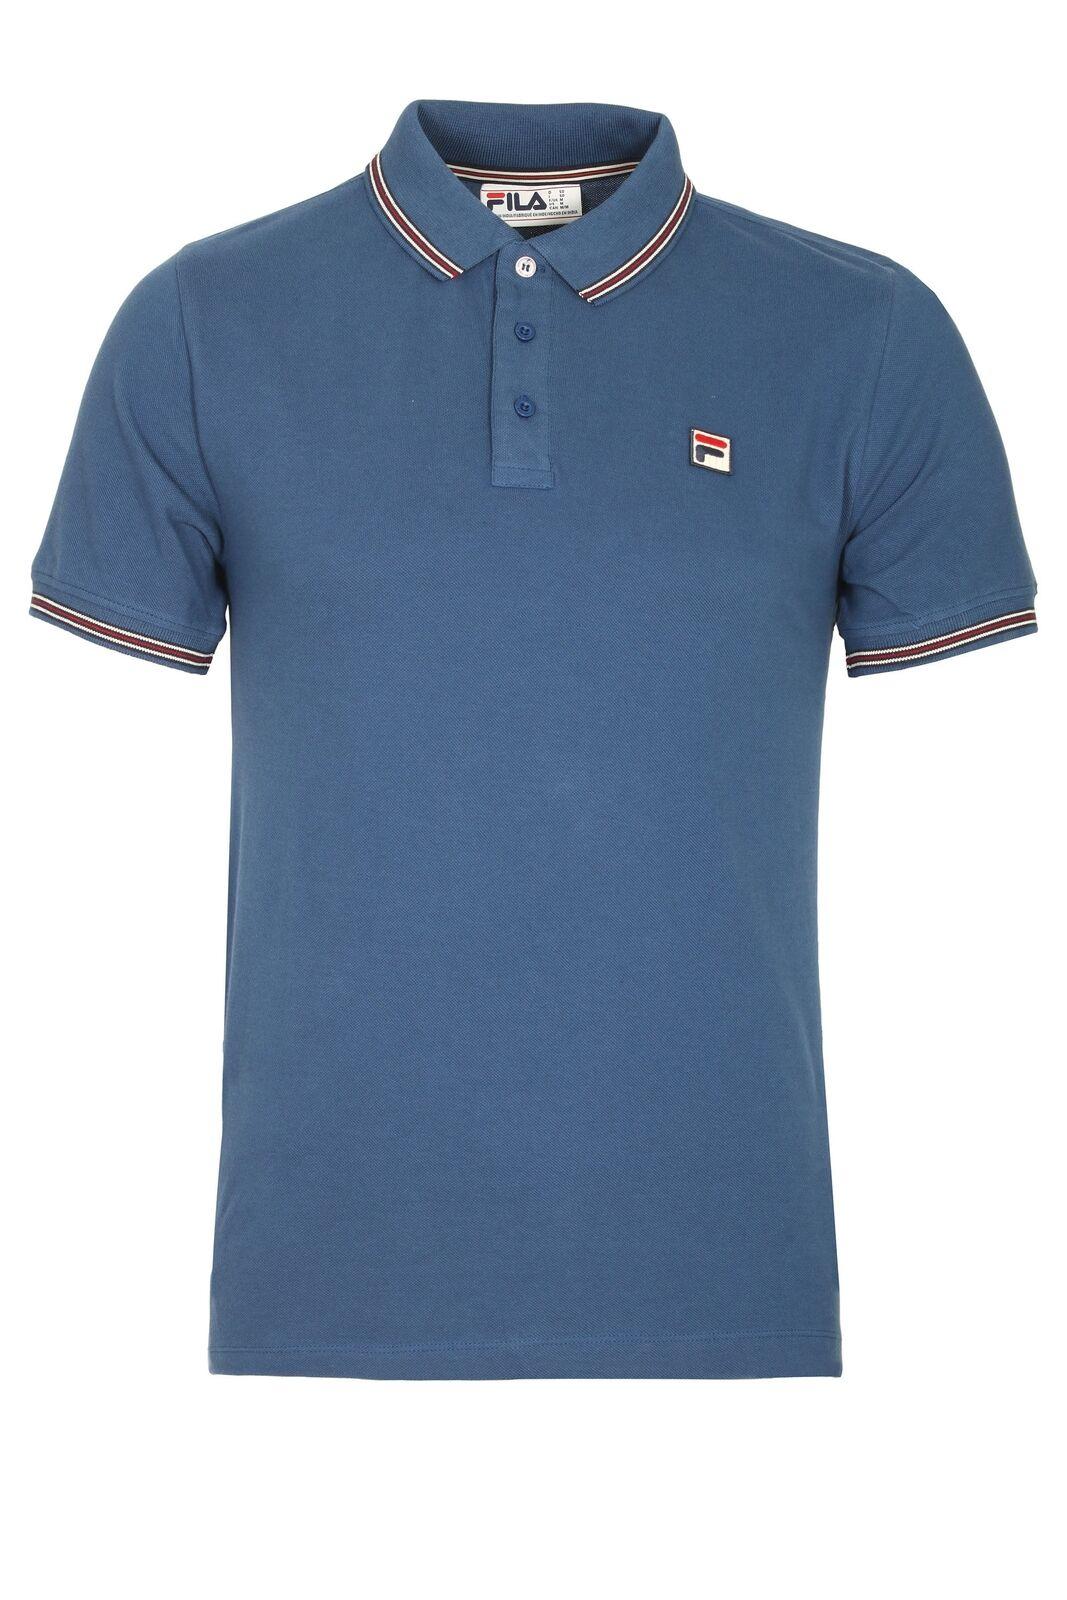 Mens Polo FILA VINTAGE Matcho Polo Shirt   True Navy